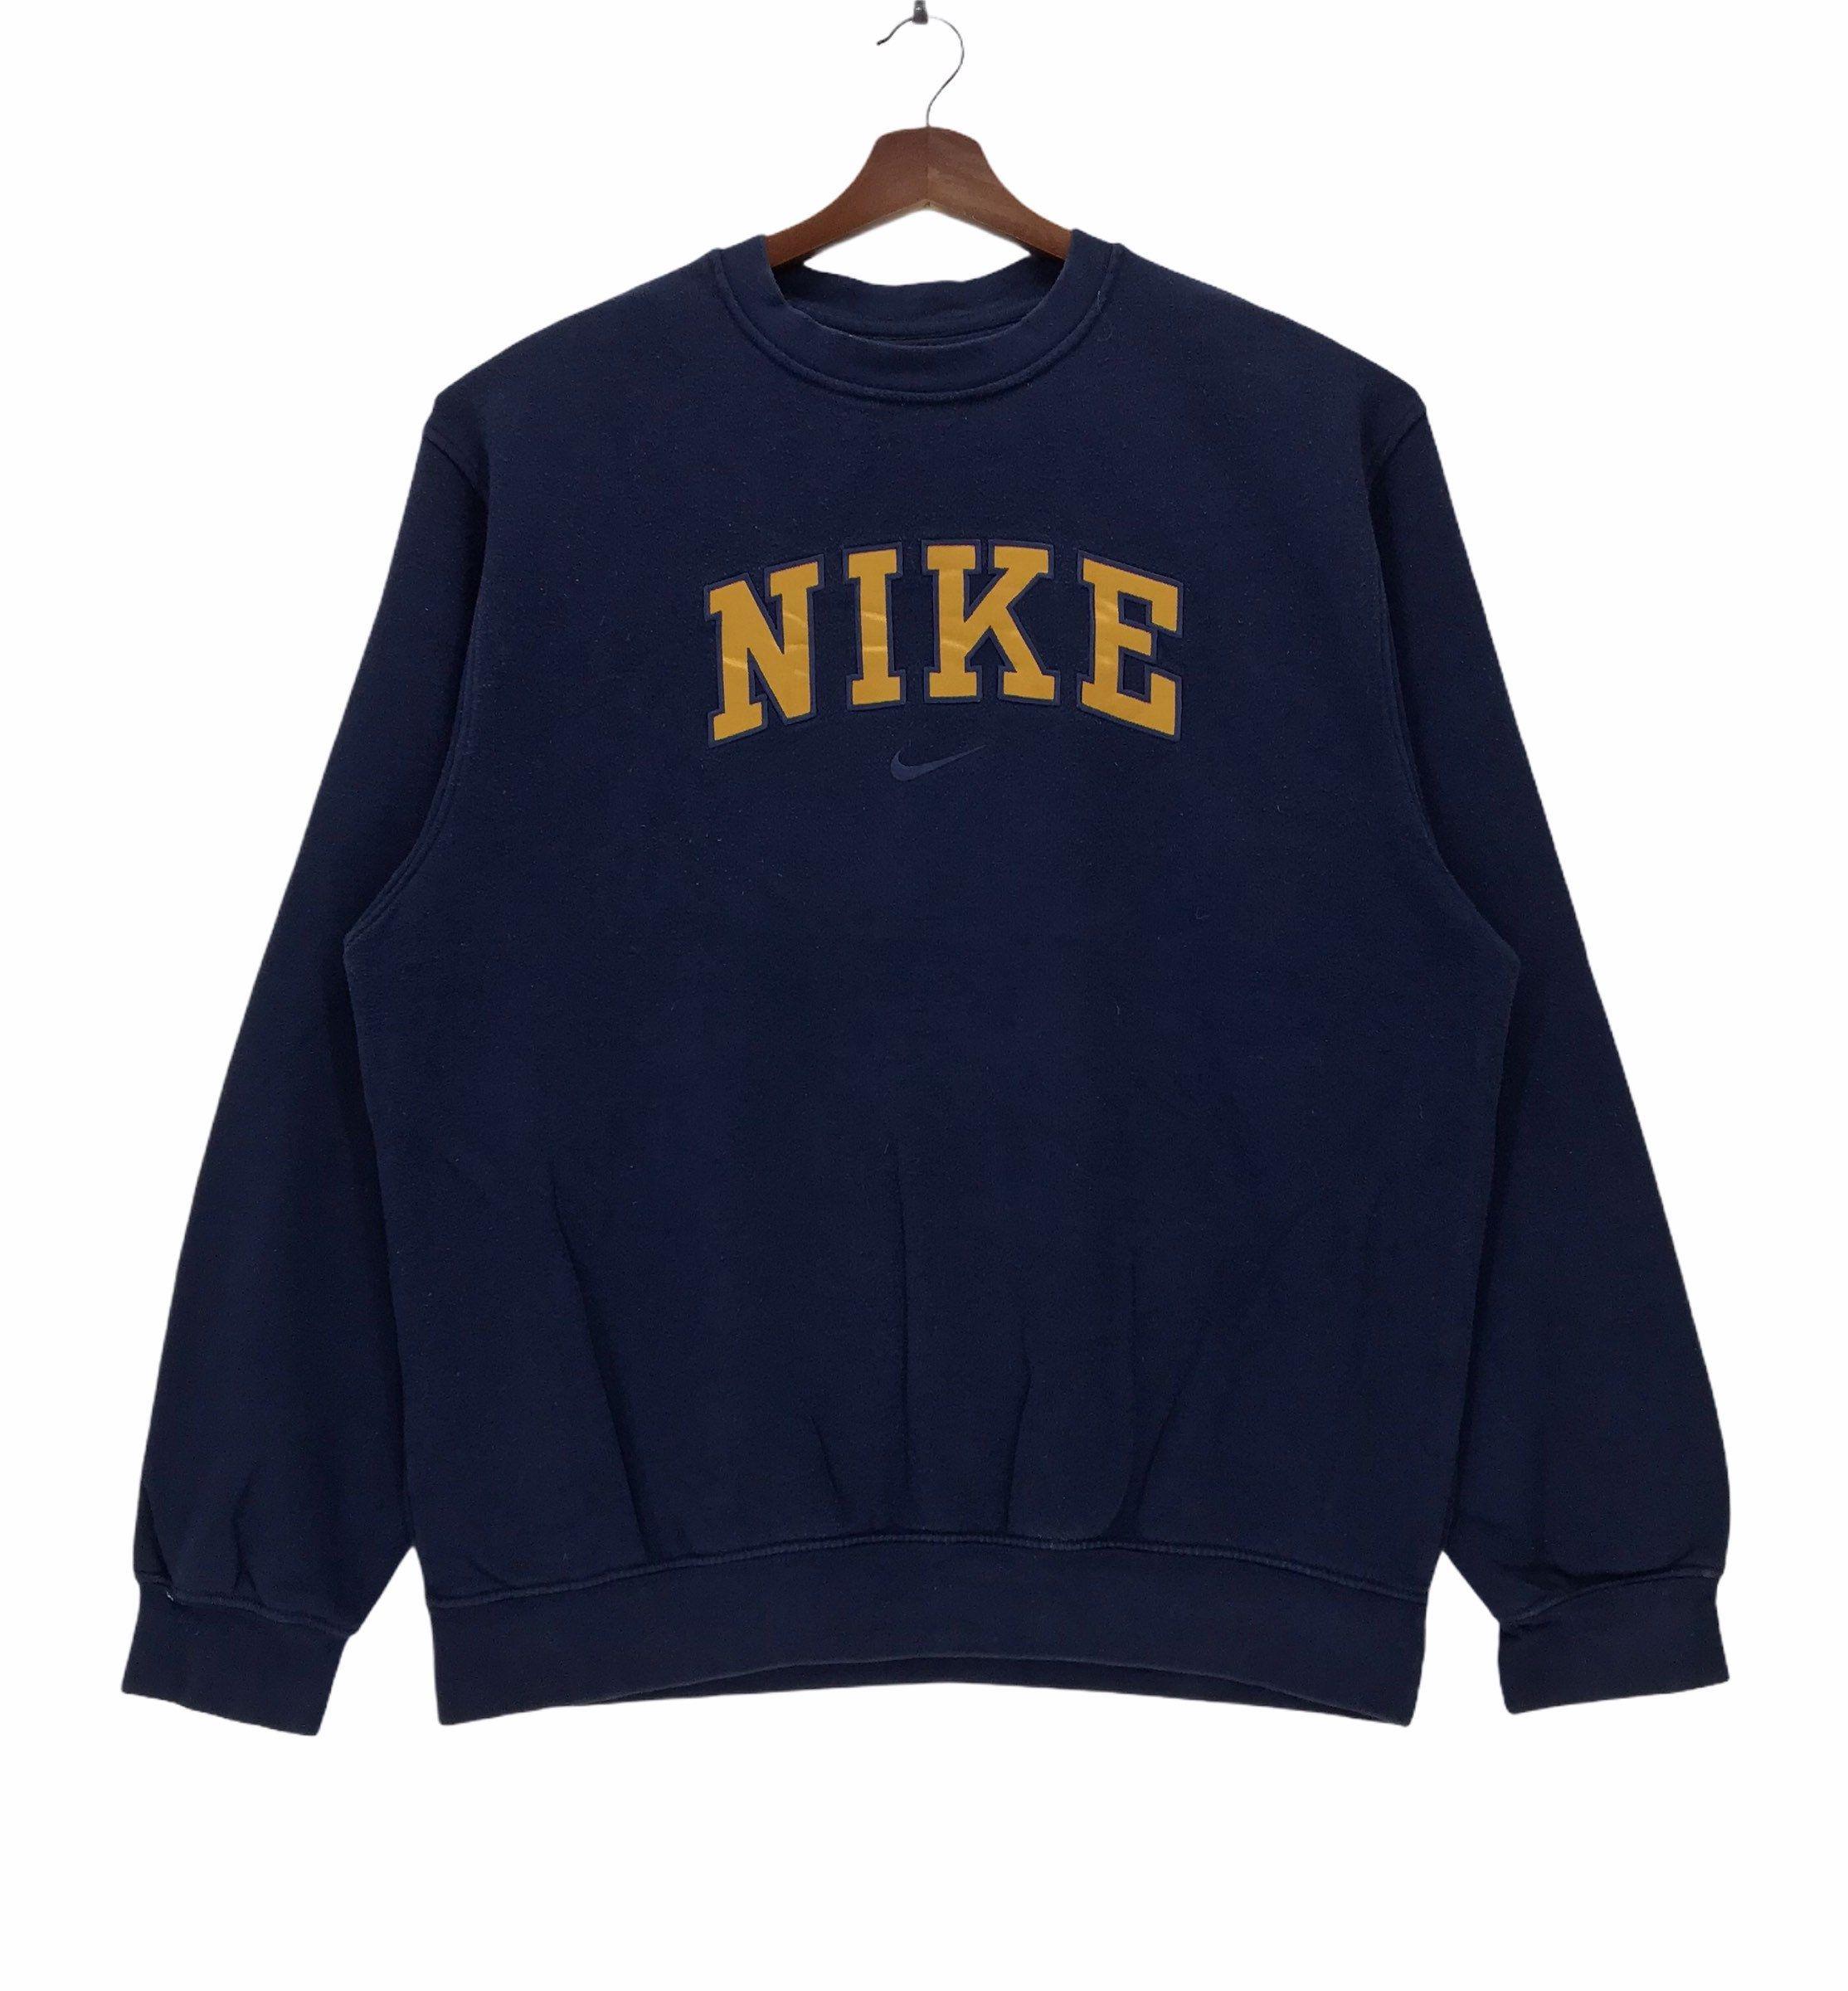 Y2k Blue Nike Vintage Sweatshirt Embroidery Nike Spellout Big Etsy Sweatshirts Nike Crewneck Sweatshirt Nike Crewneck [ 2400 x 2228 Pixel ]